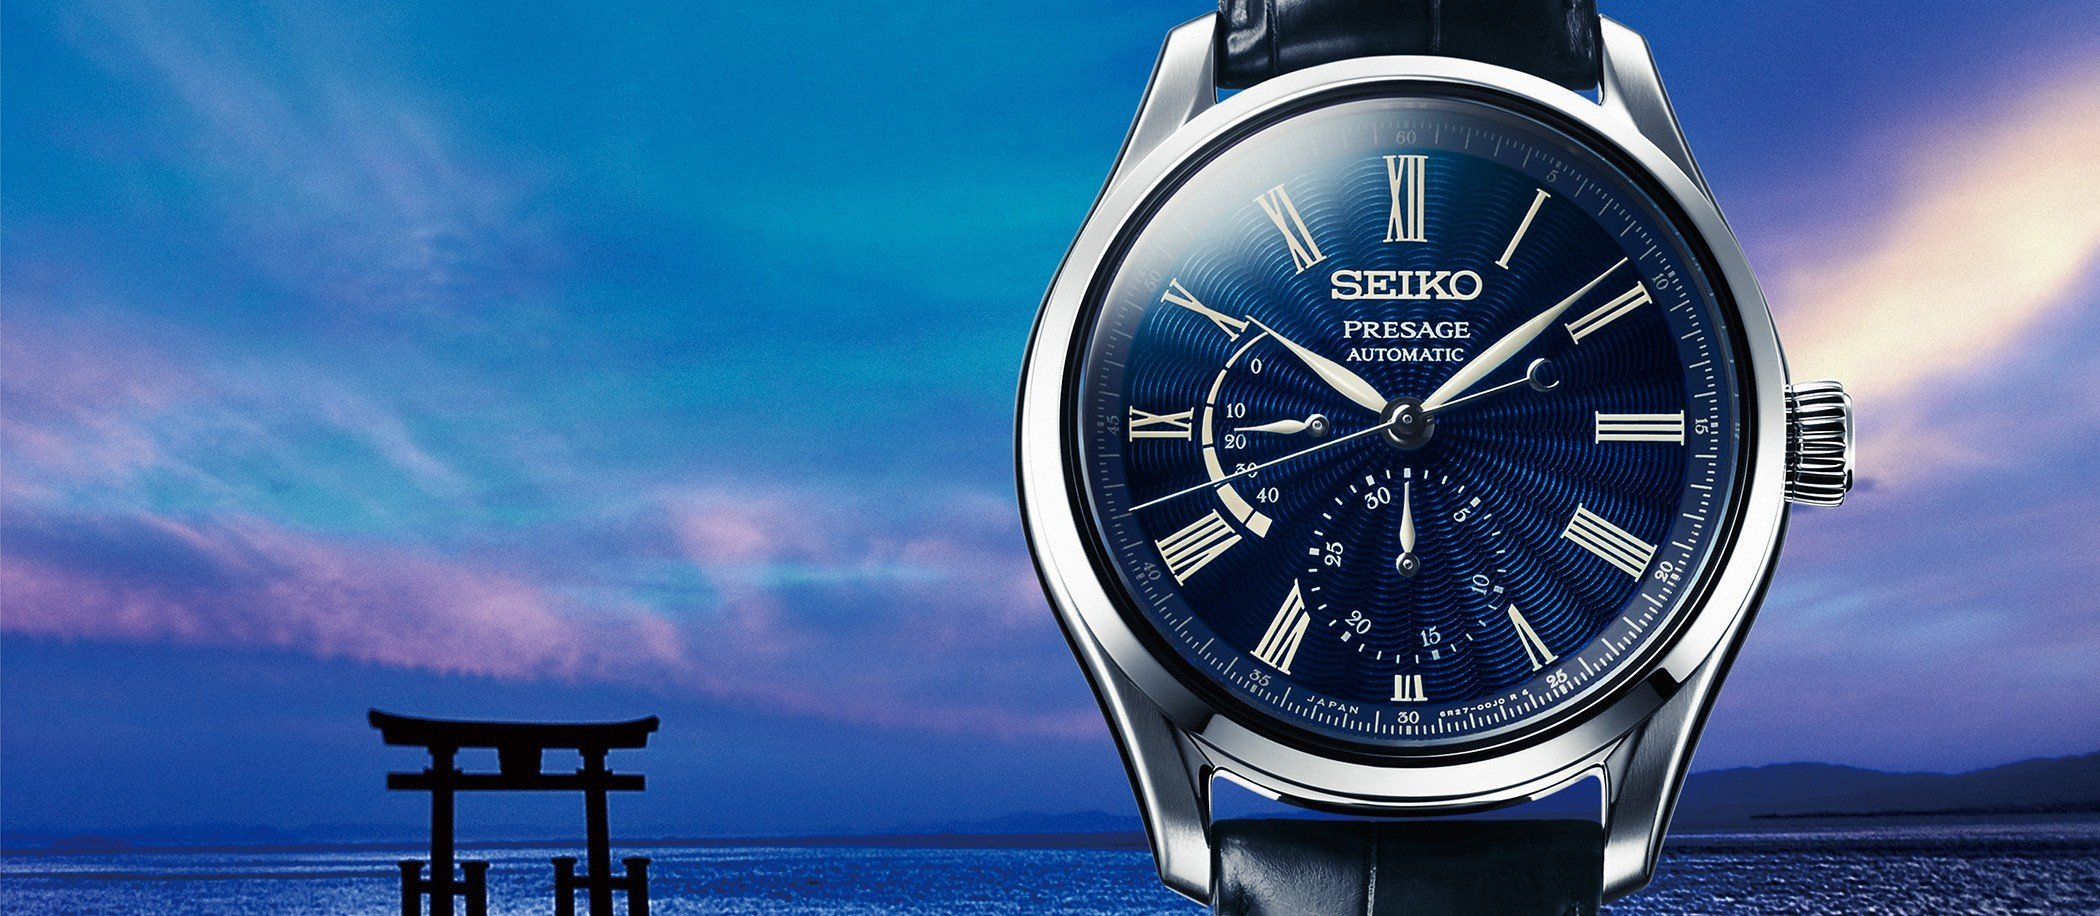 Seiko Presage Shippo Enamel Limited Edition